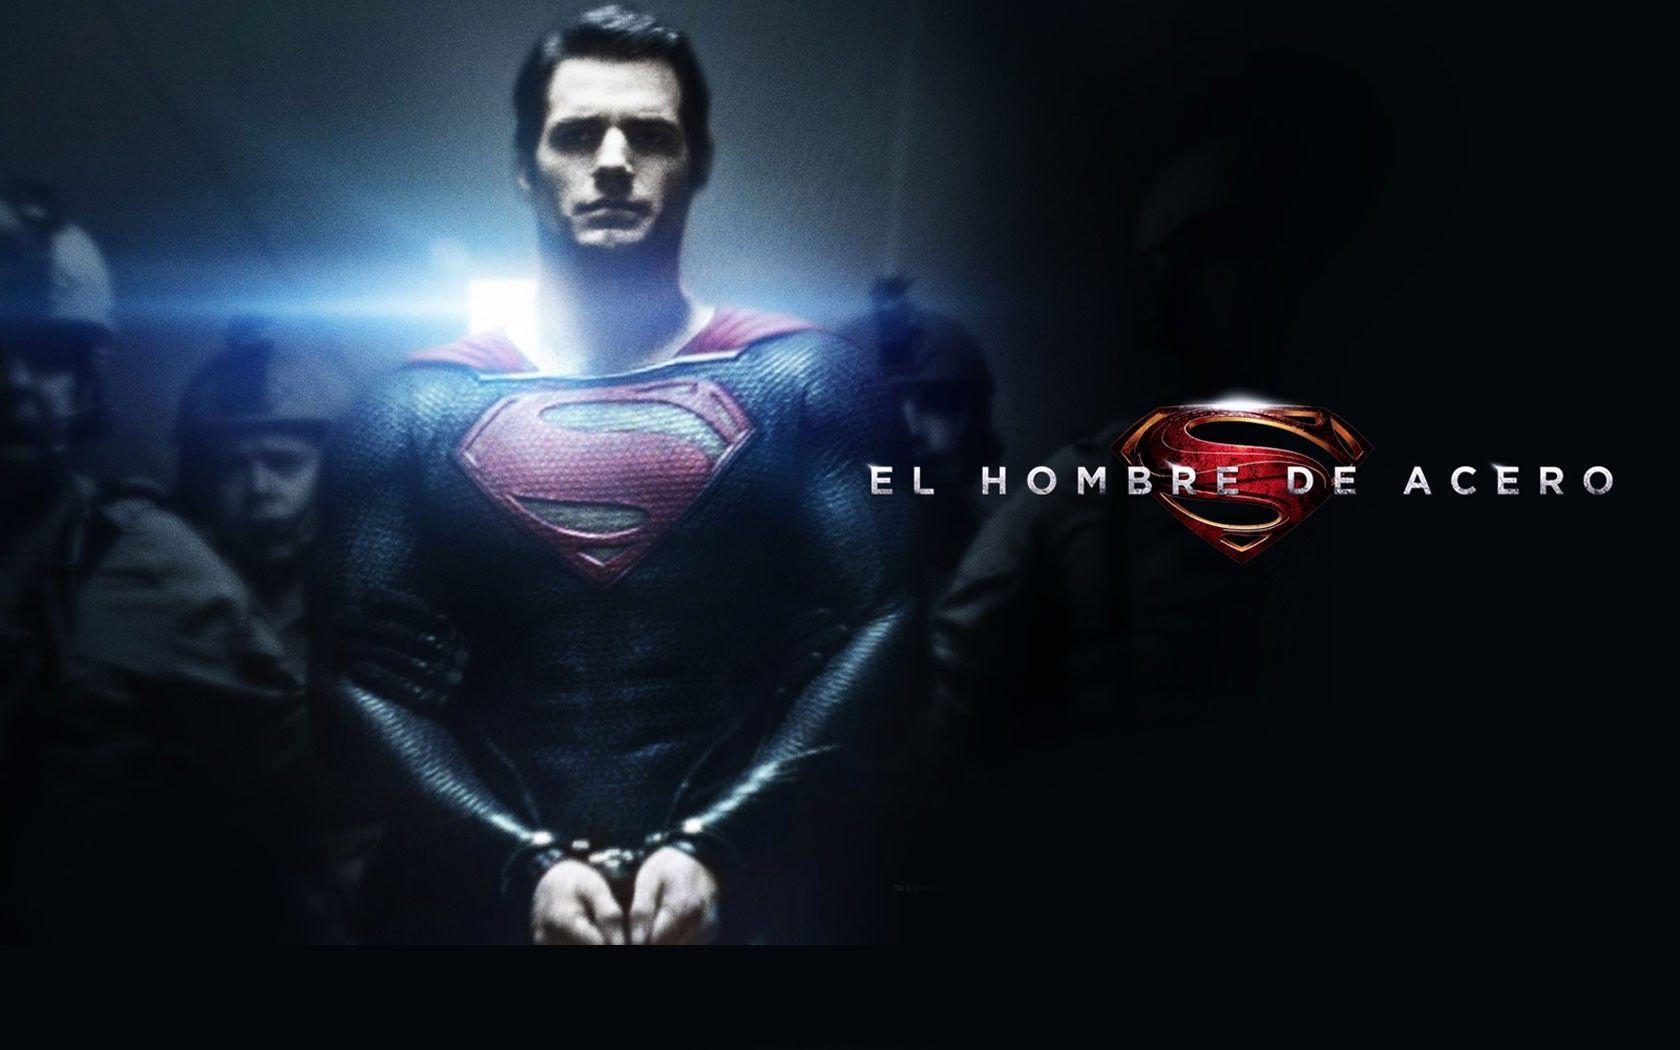 Superman Man Of Steel Movie Wallpapers - Wallpaper Cave